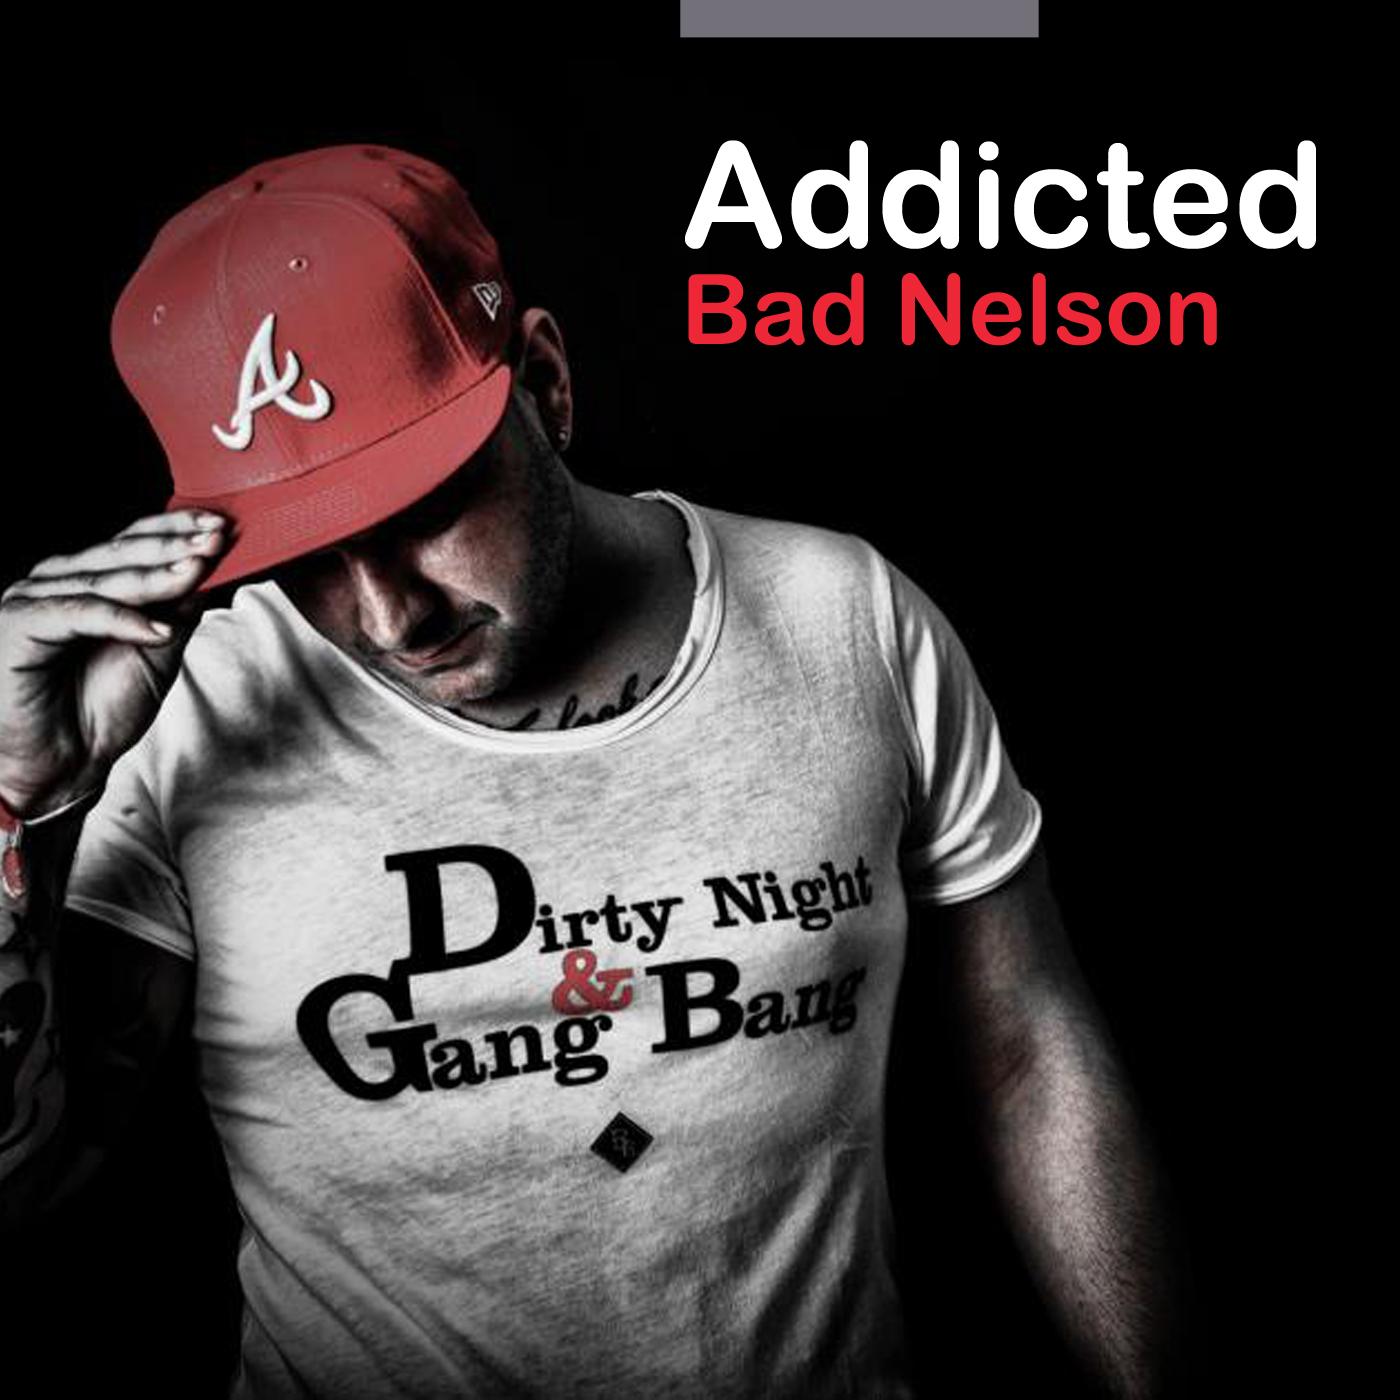 <![CDATA[Addicted]]>